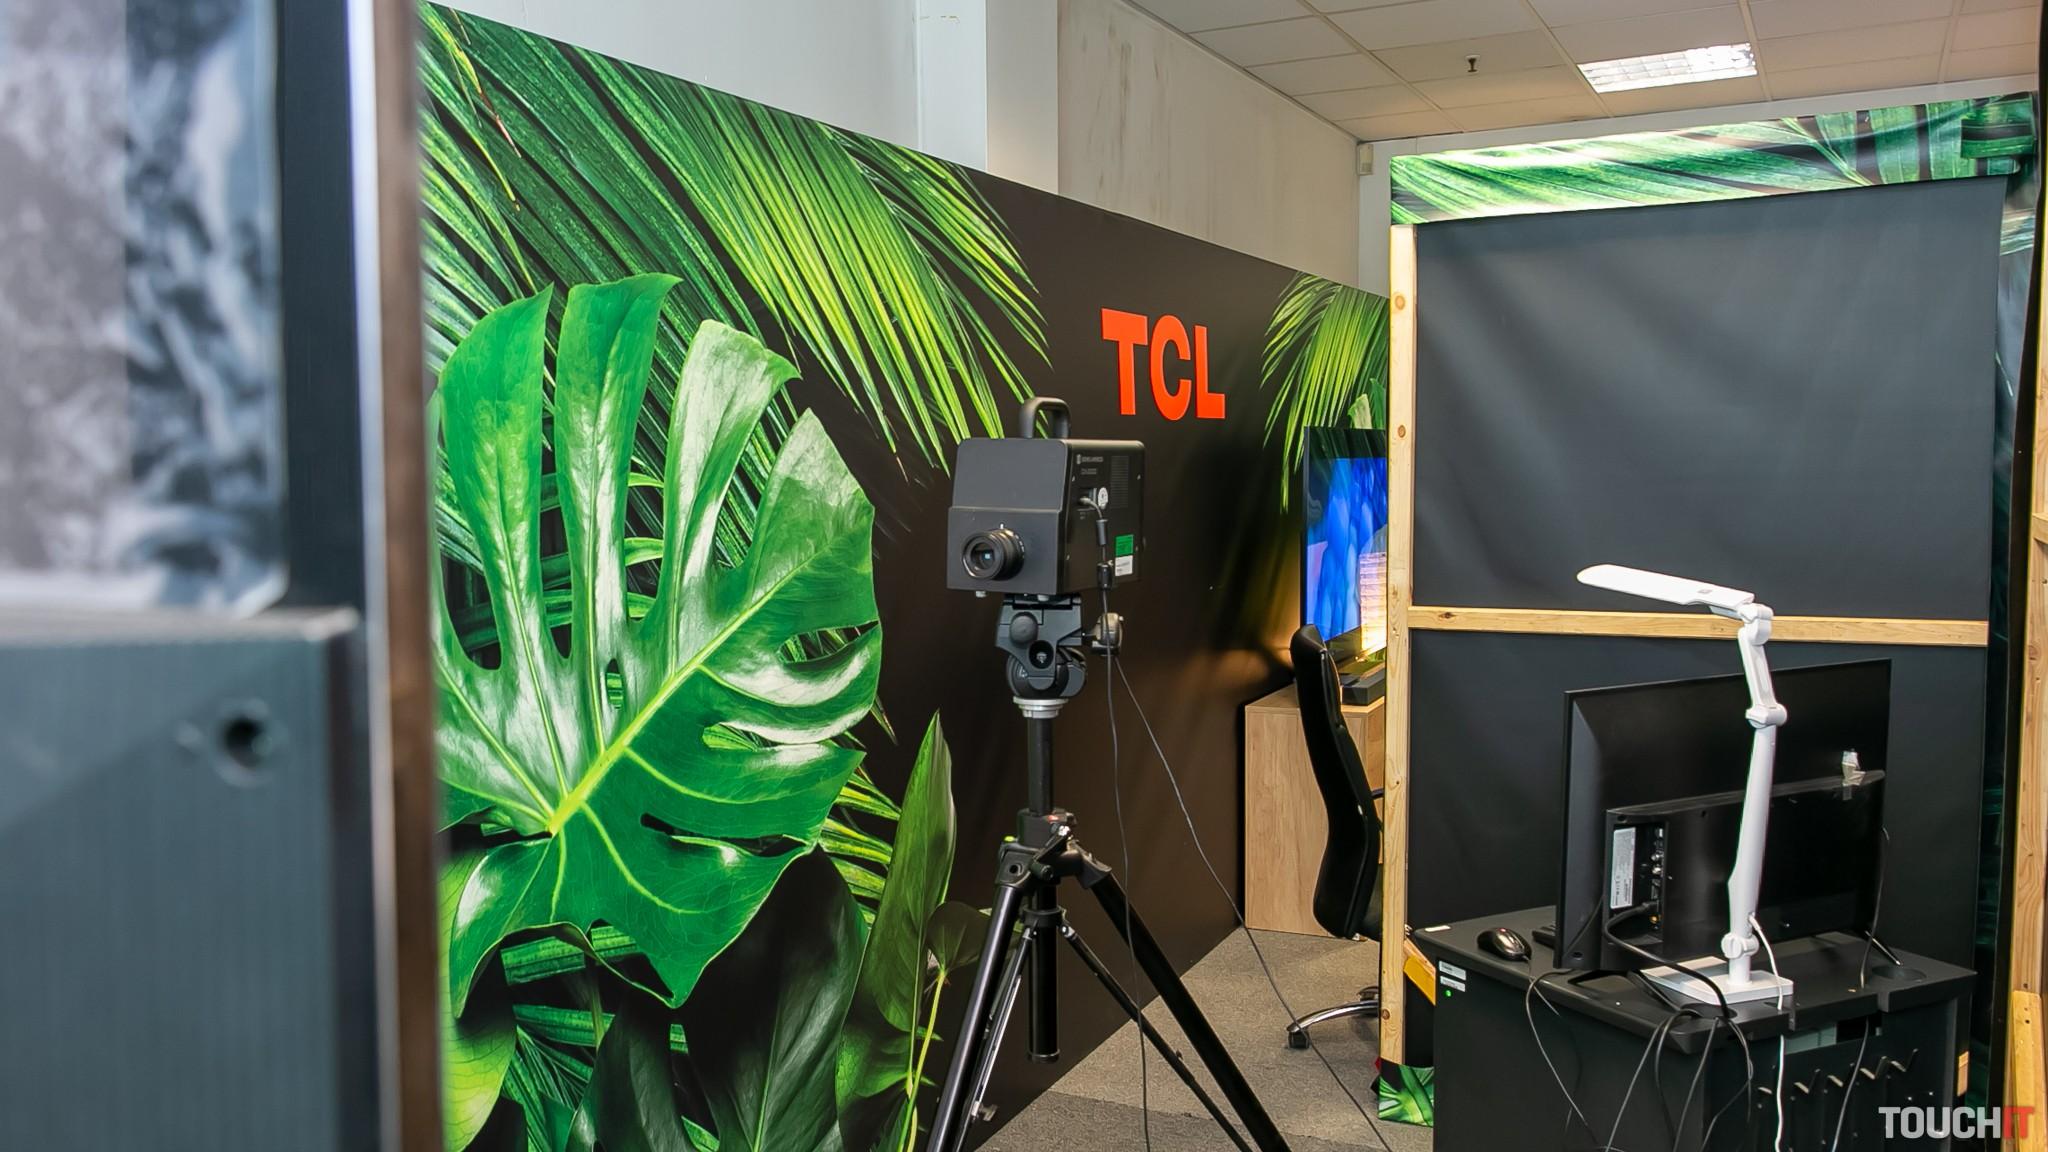 Kontrola svietivosti televízora TCL pomocou meracieho prístroja Minolta